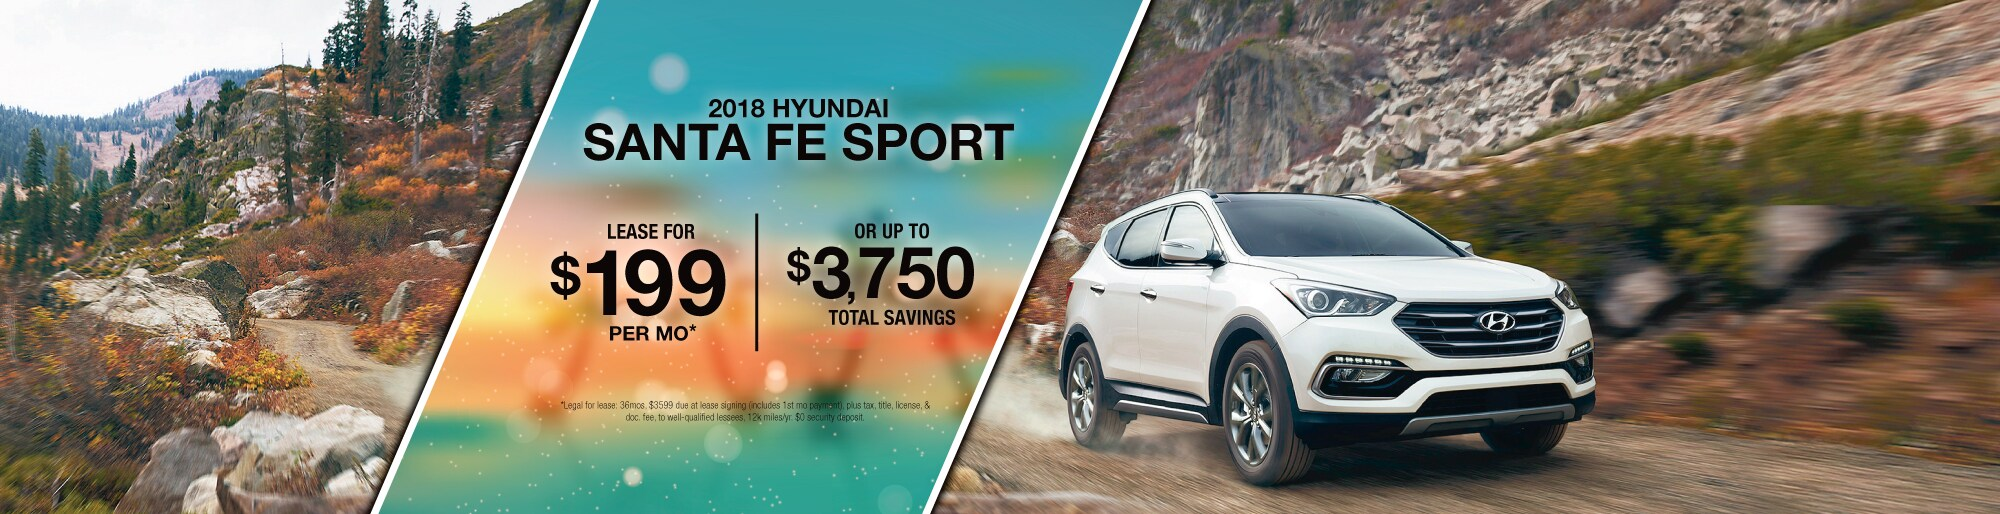 news pinterest super car and dealership pin interior cars hyundai milwaukee